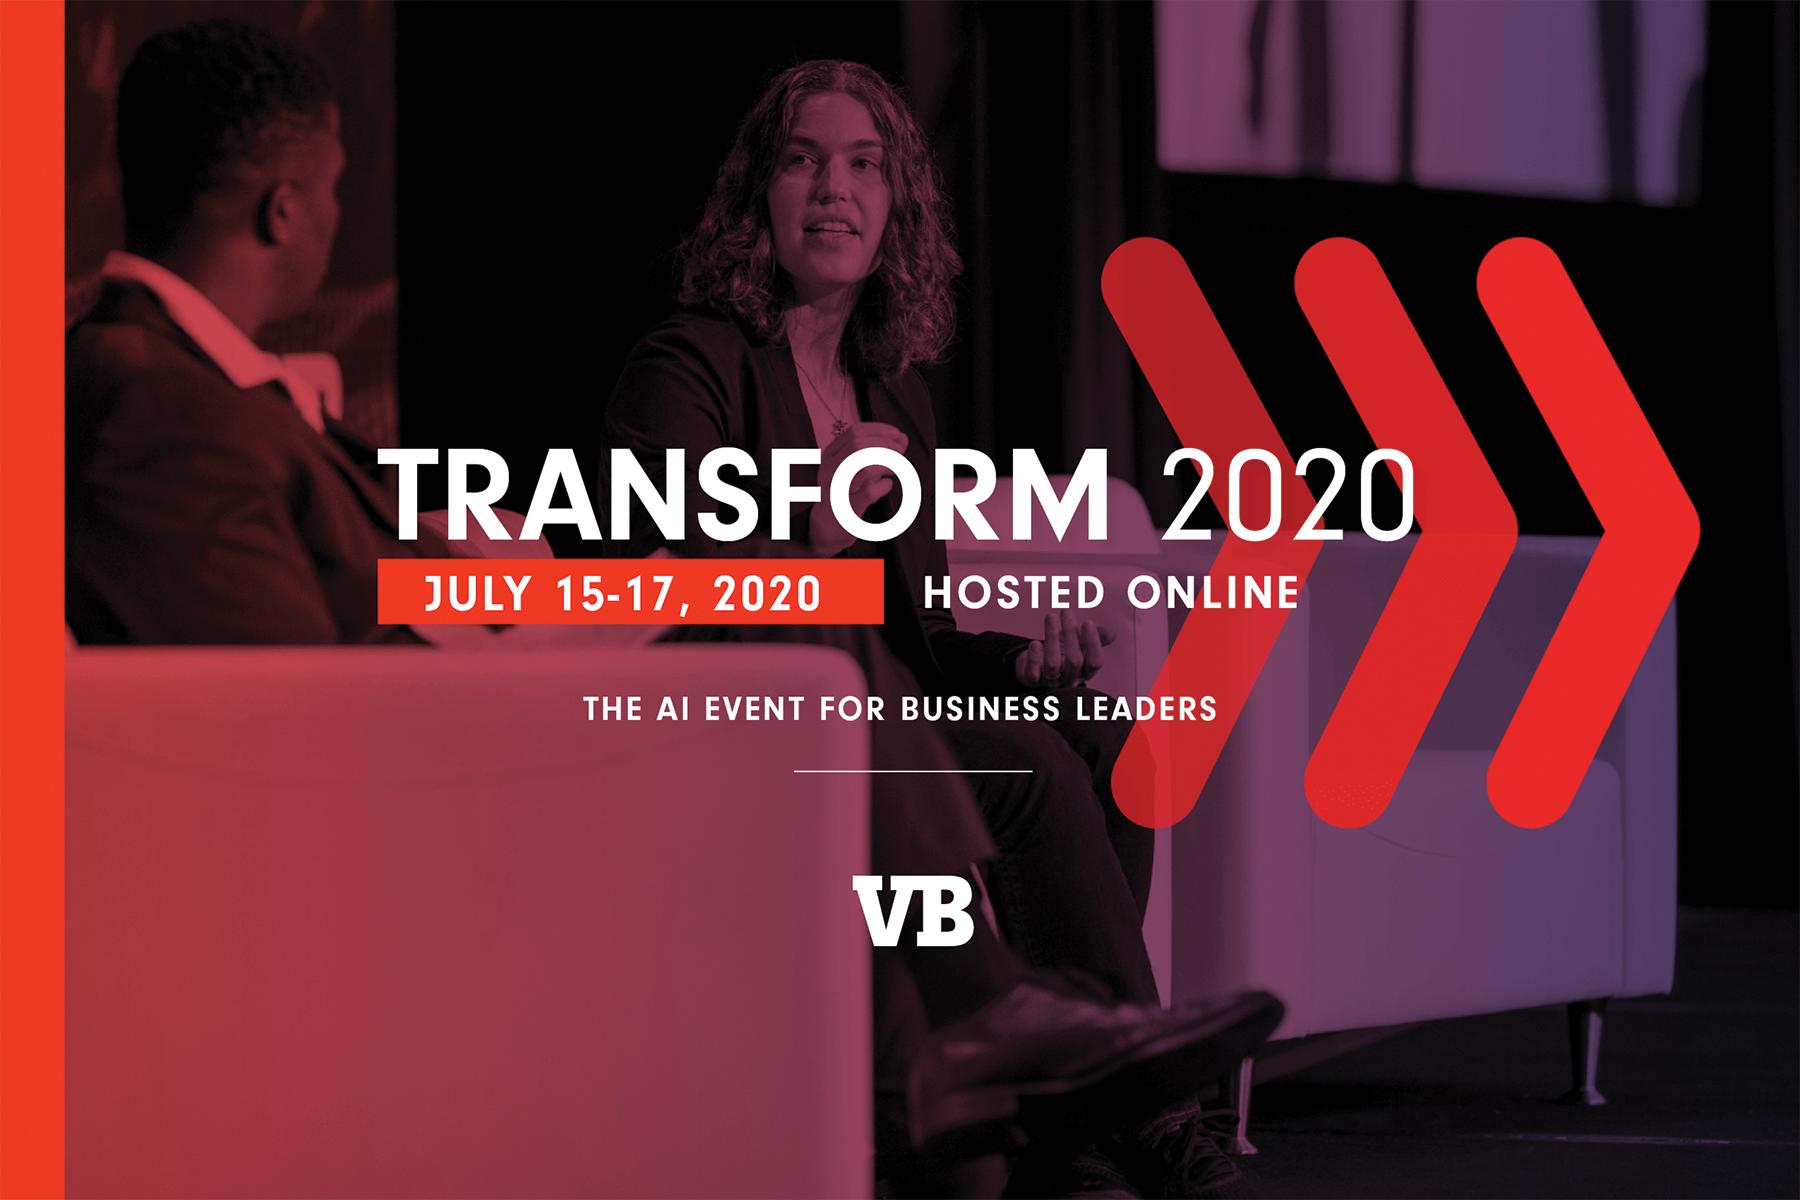 venturebeat.com - VB Staff - Transform 2020: 4 days of deep-dive AI learning